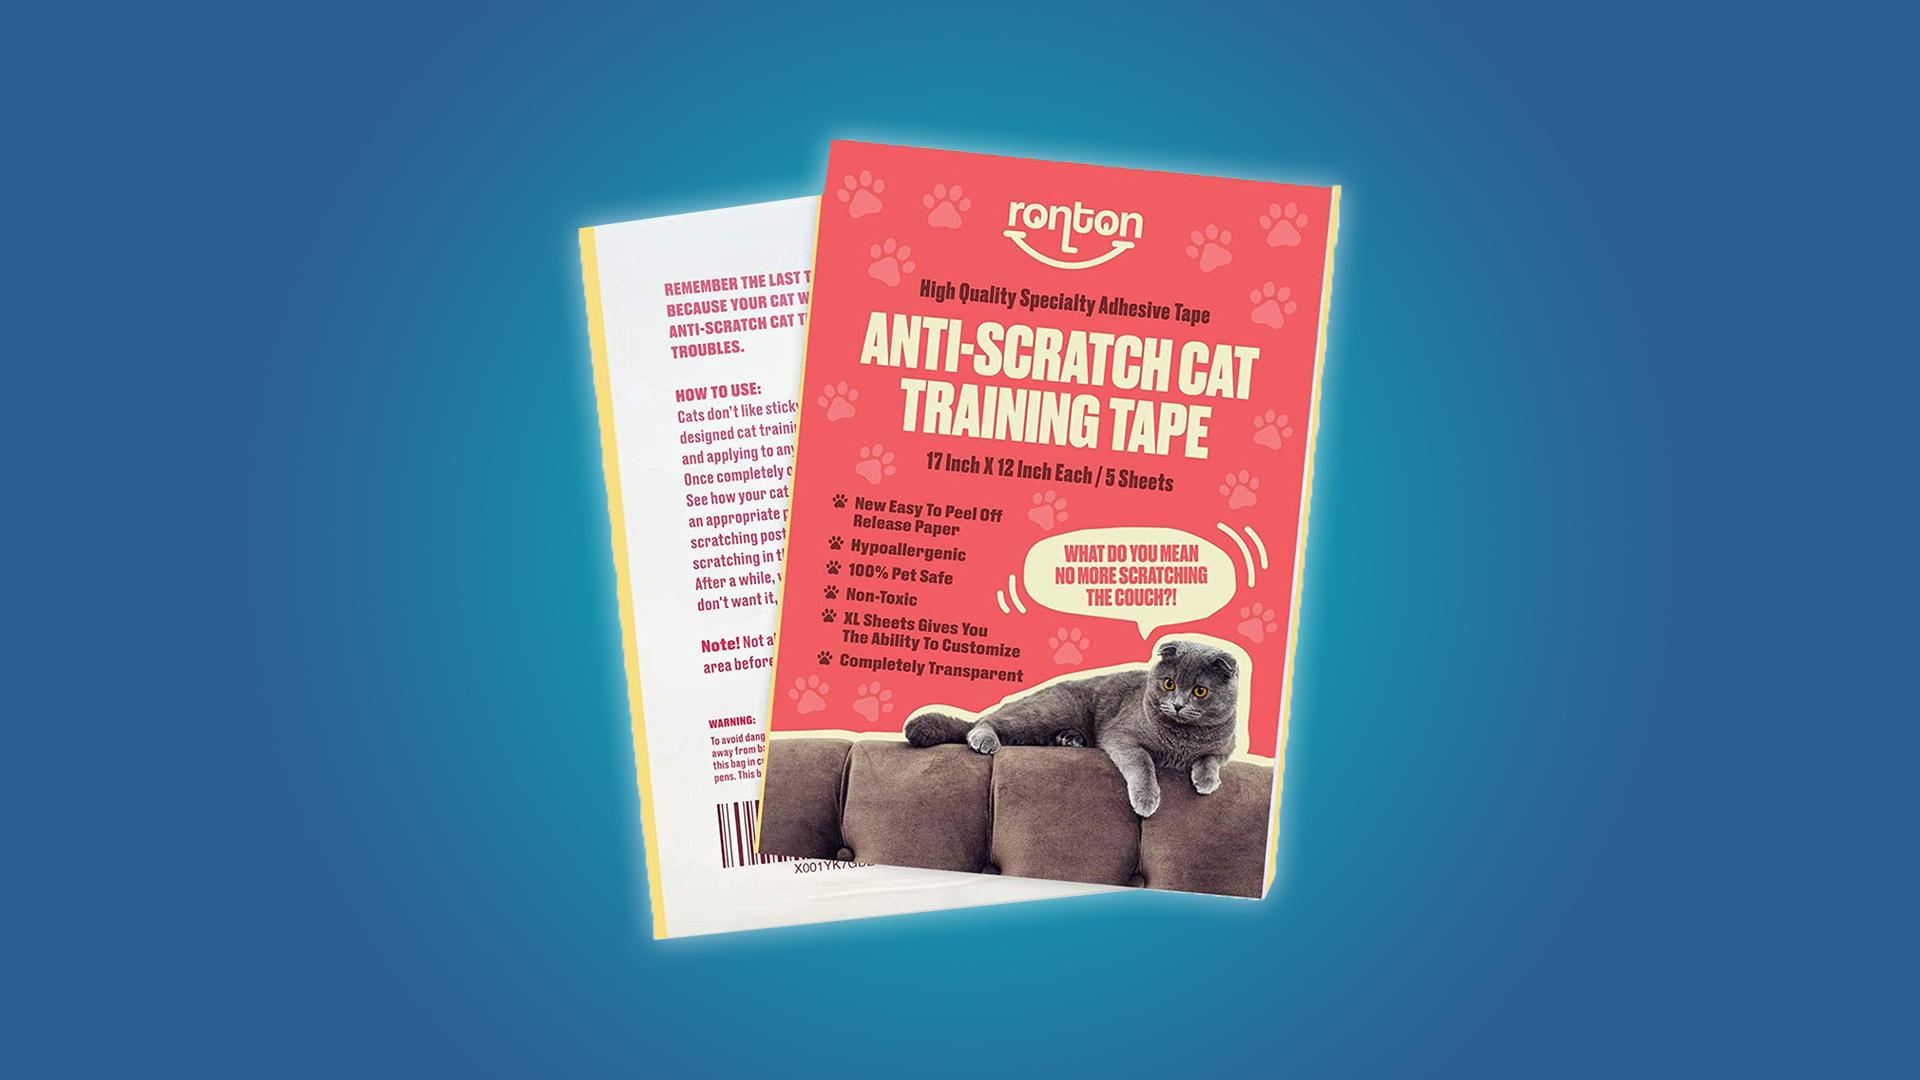 The Ronton Anti-Scratch Training Tape